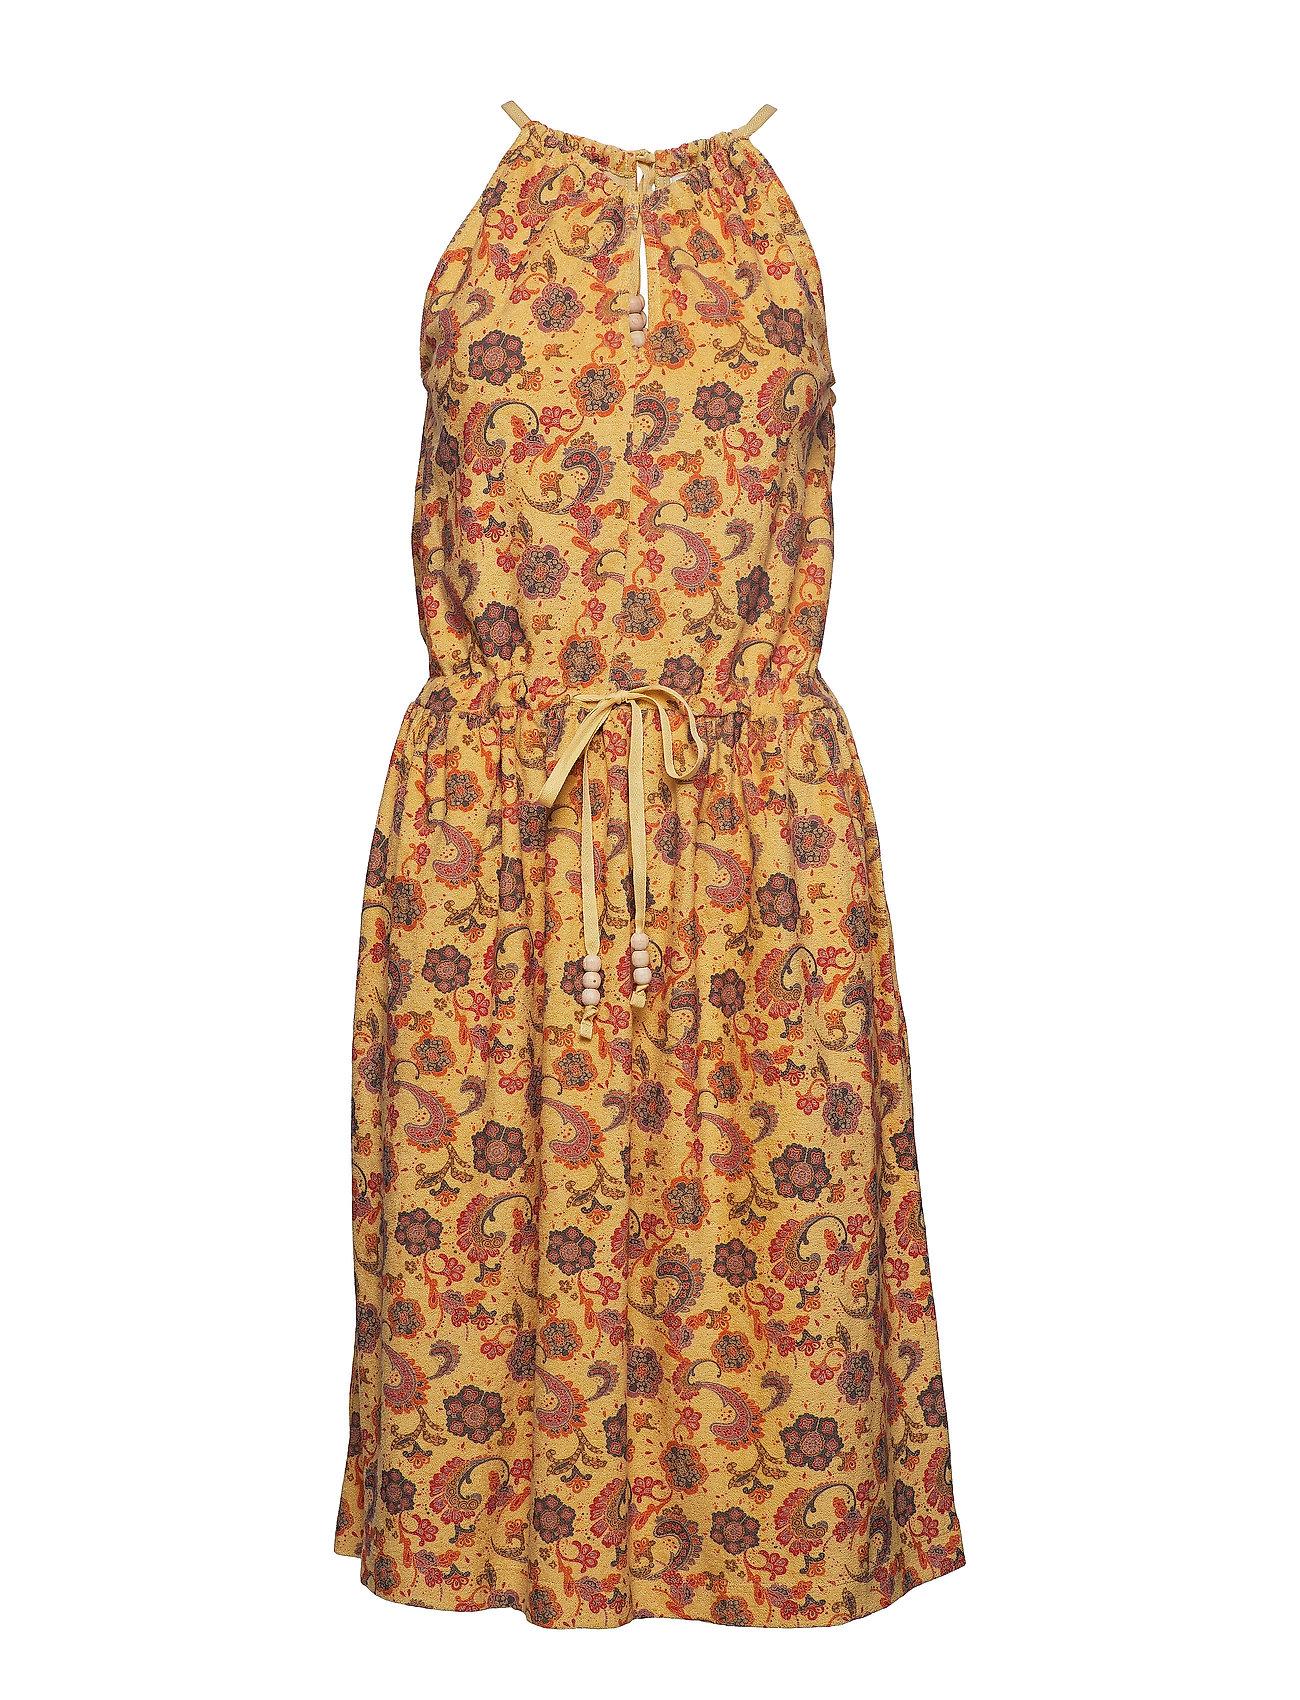 Sleevelessprint Dress Dress Dress Sleevelessprint YellowNoa YellowNoa Sleevelessprint YellowNoa Dress Sleevelessprint m8vnwOyN0P